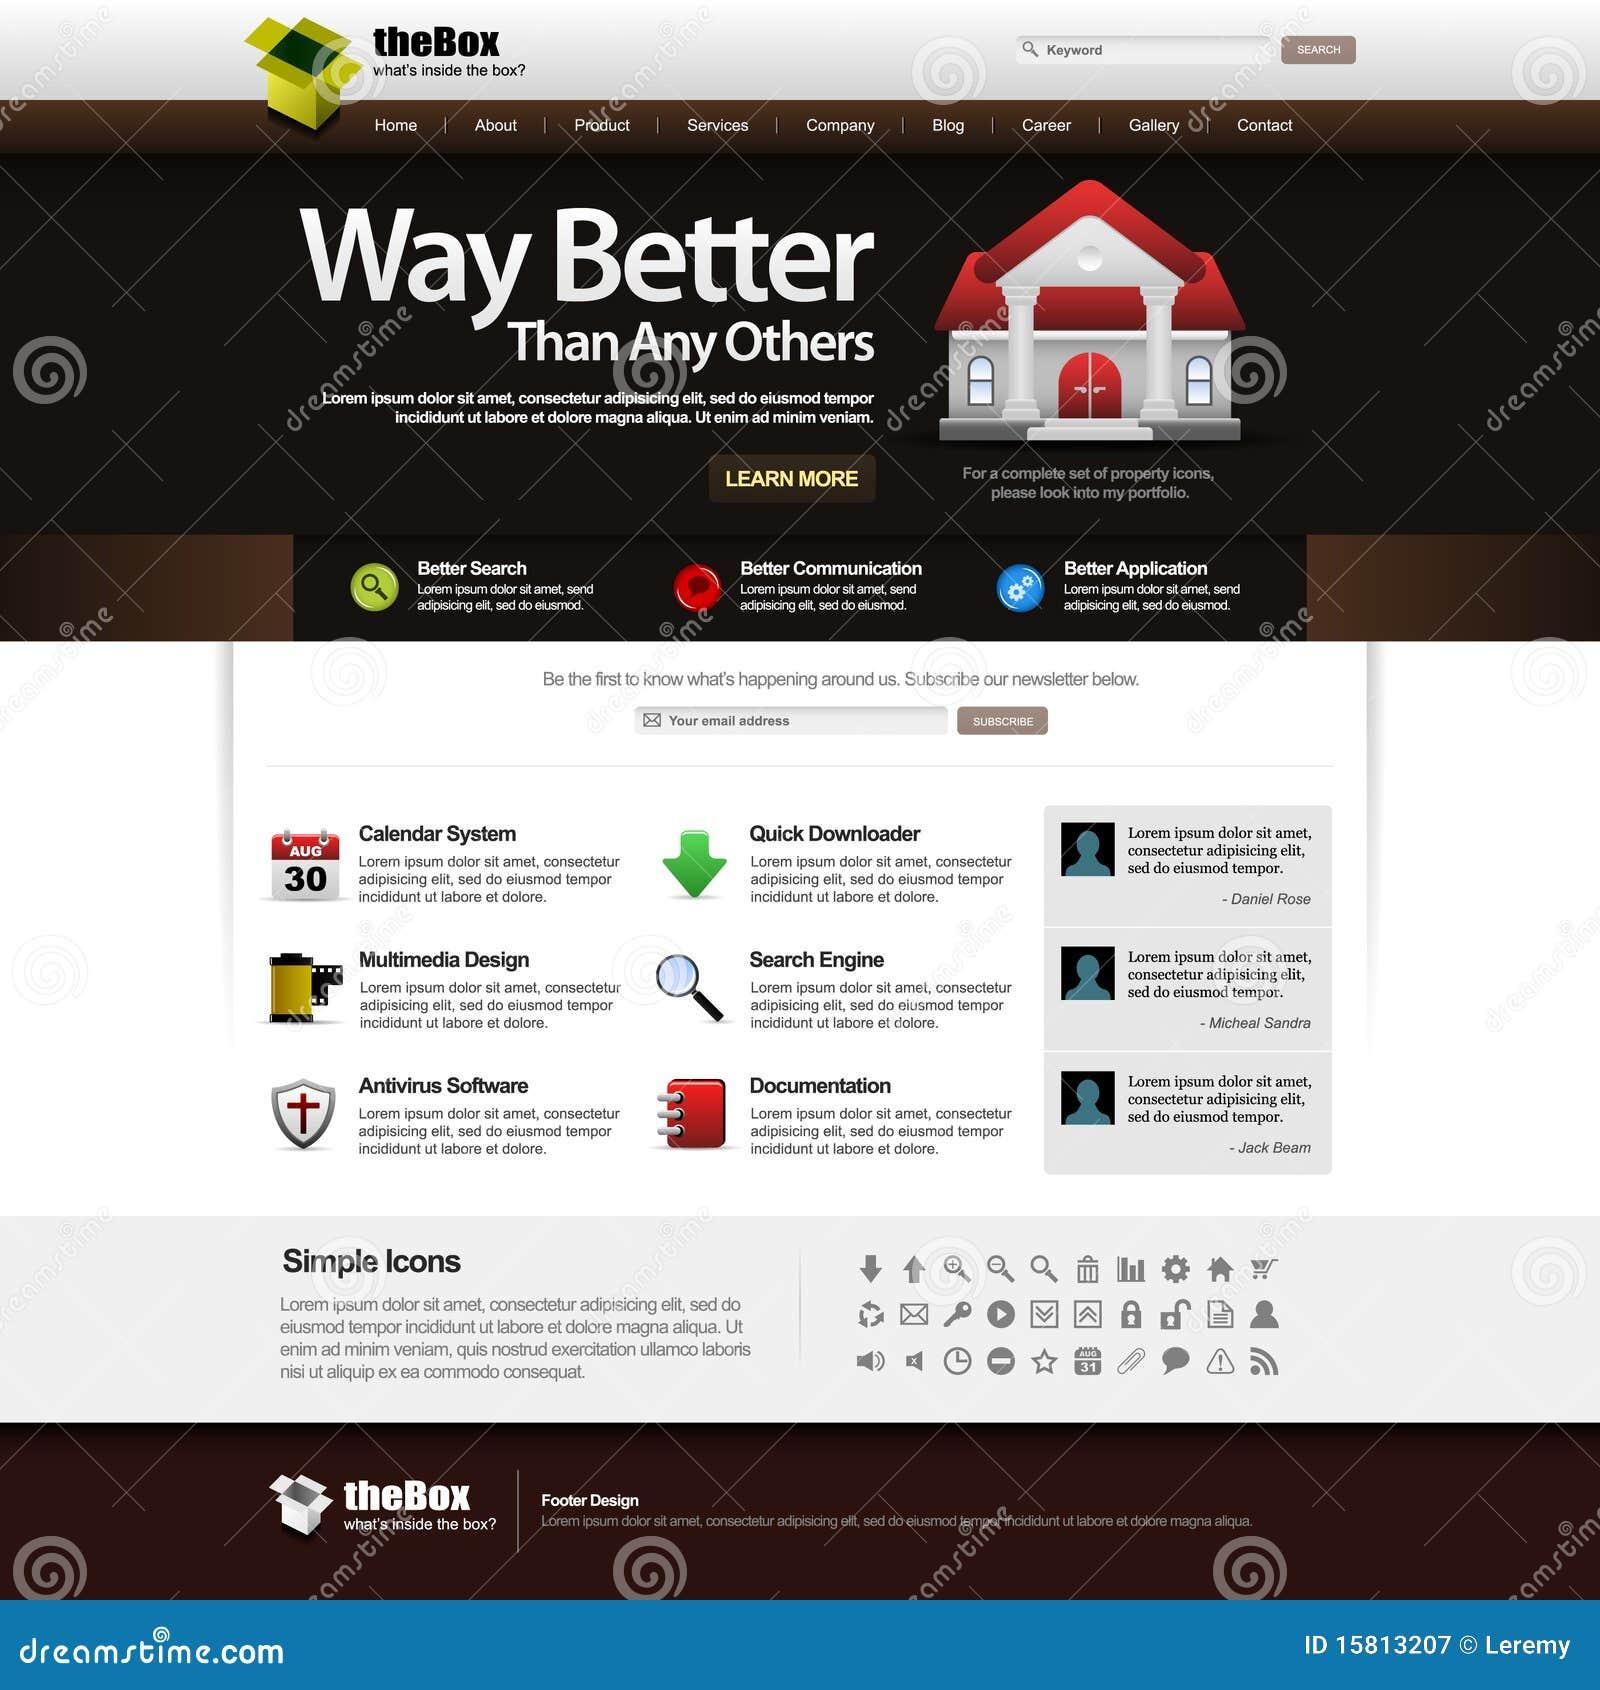 Architecture Outline Web Site: Web Design Template Element 14 (Dark Theme) Royalty Free